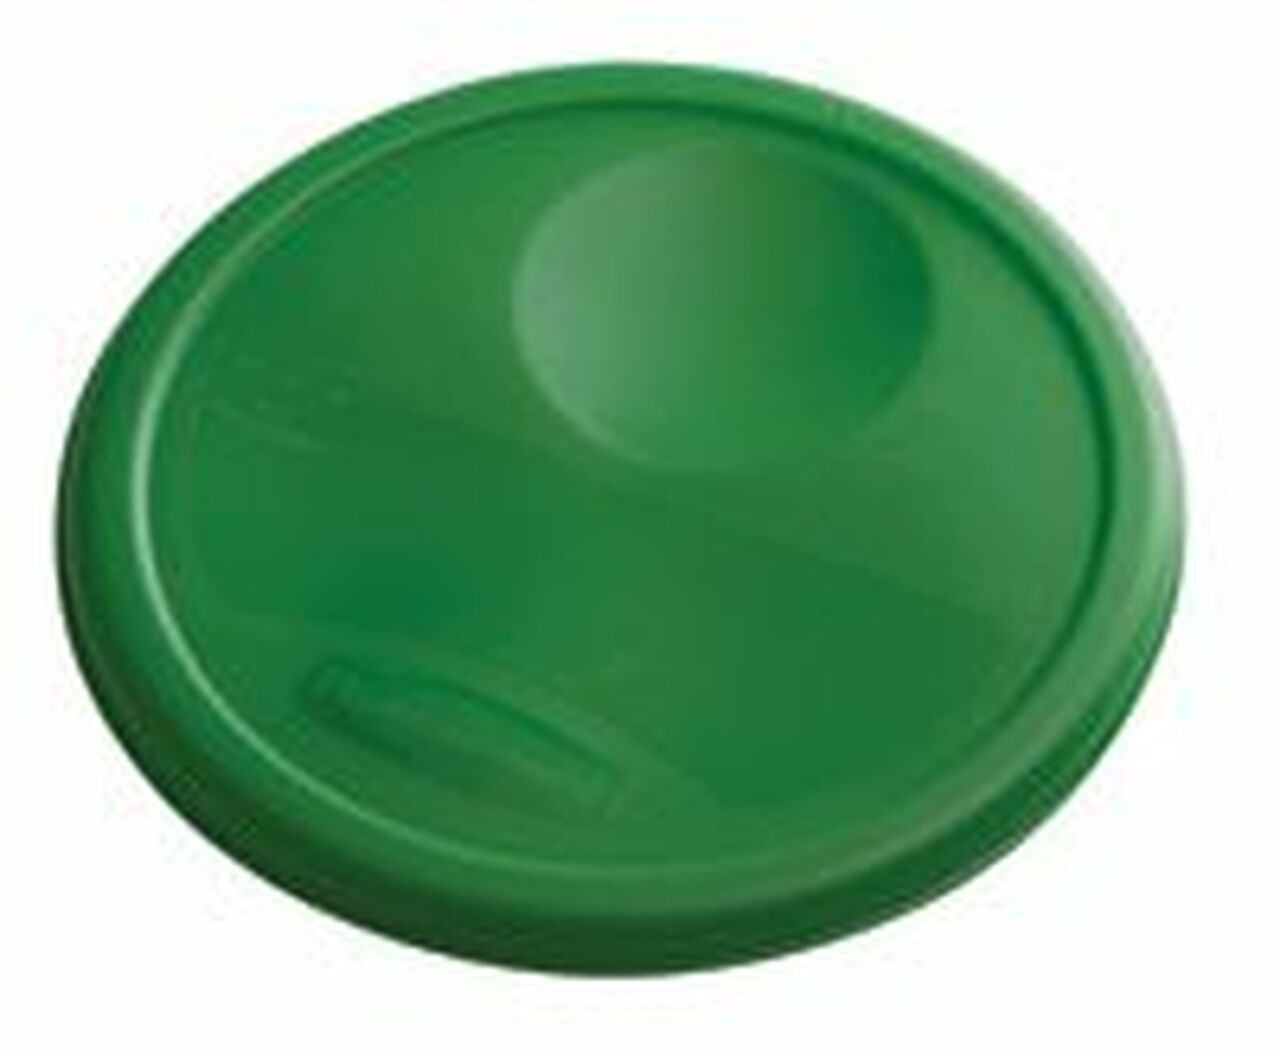 Rubbermaid Round Container Lid - Medium Green